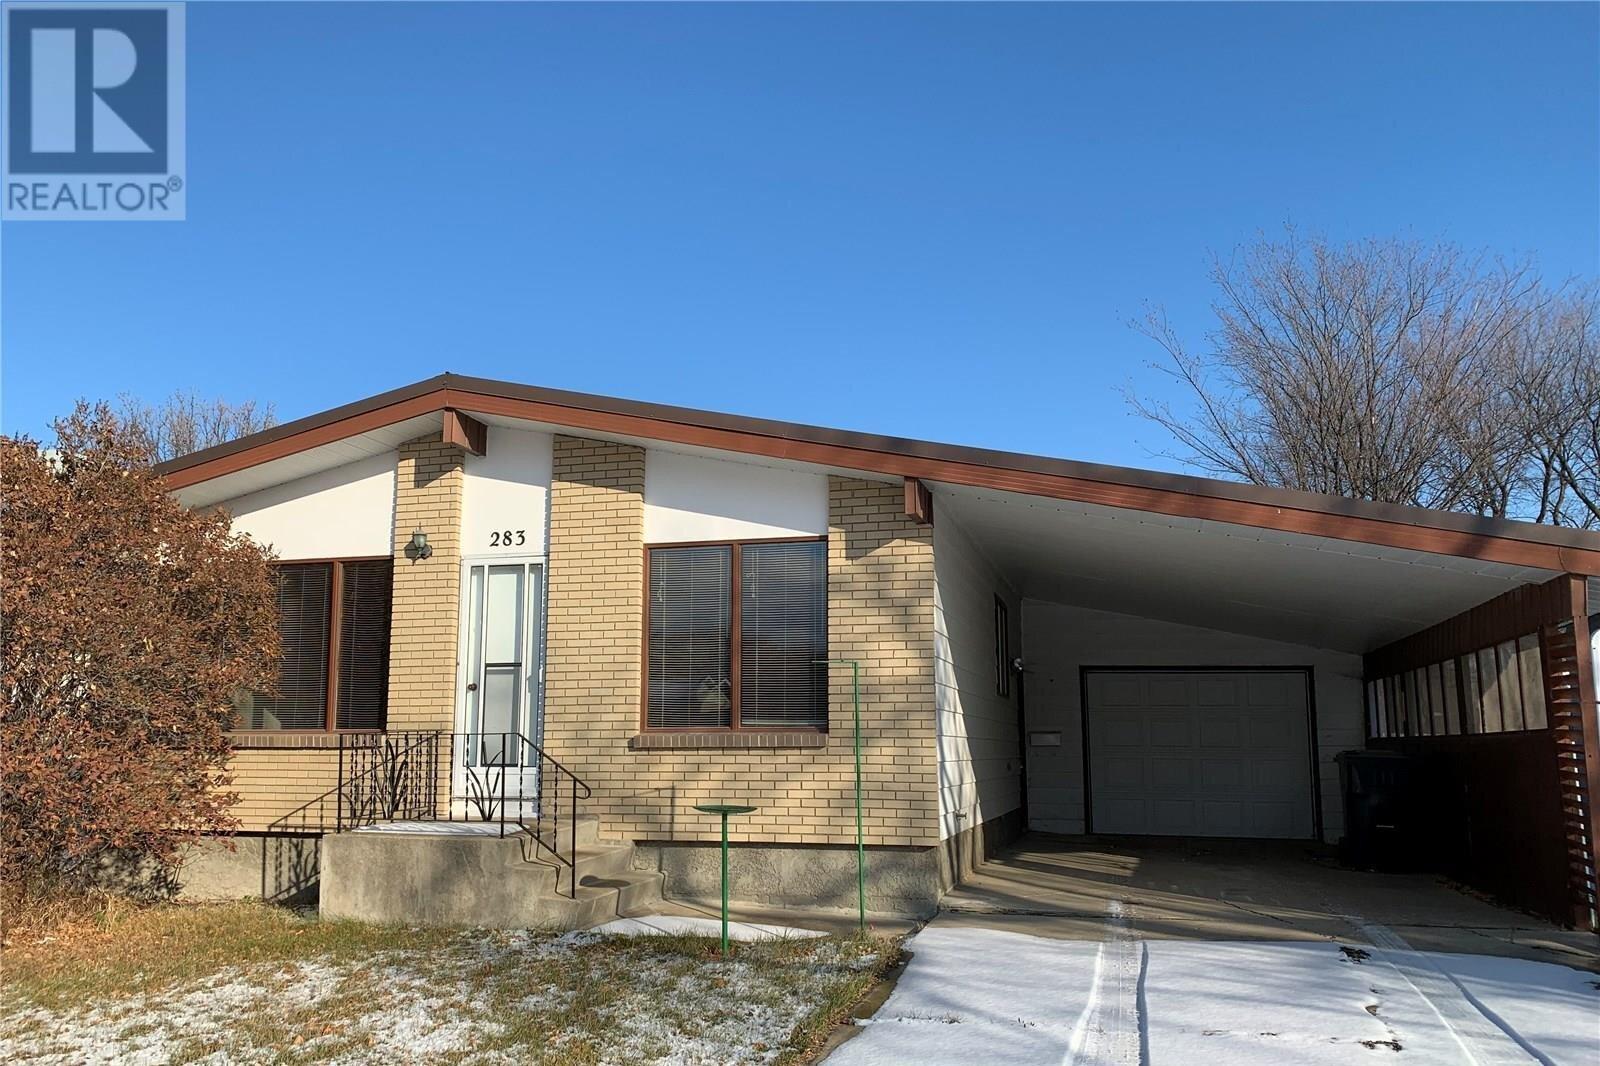 House for sale at 283 Wellington Ave N Yorkton Saskatchewan - MLS: SK821046